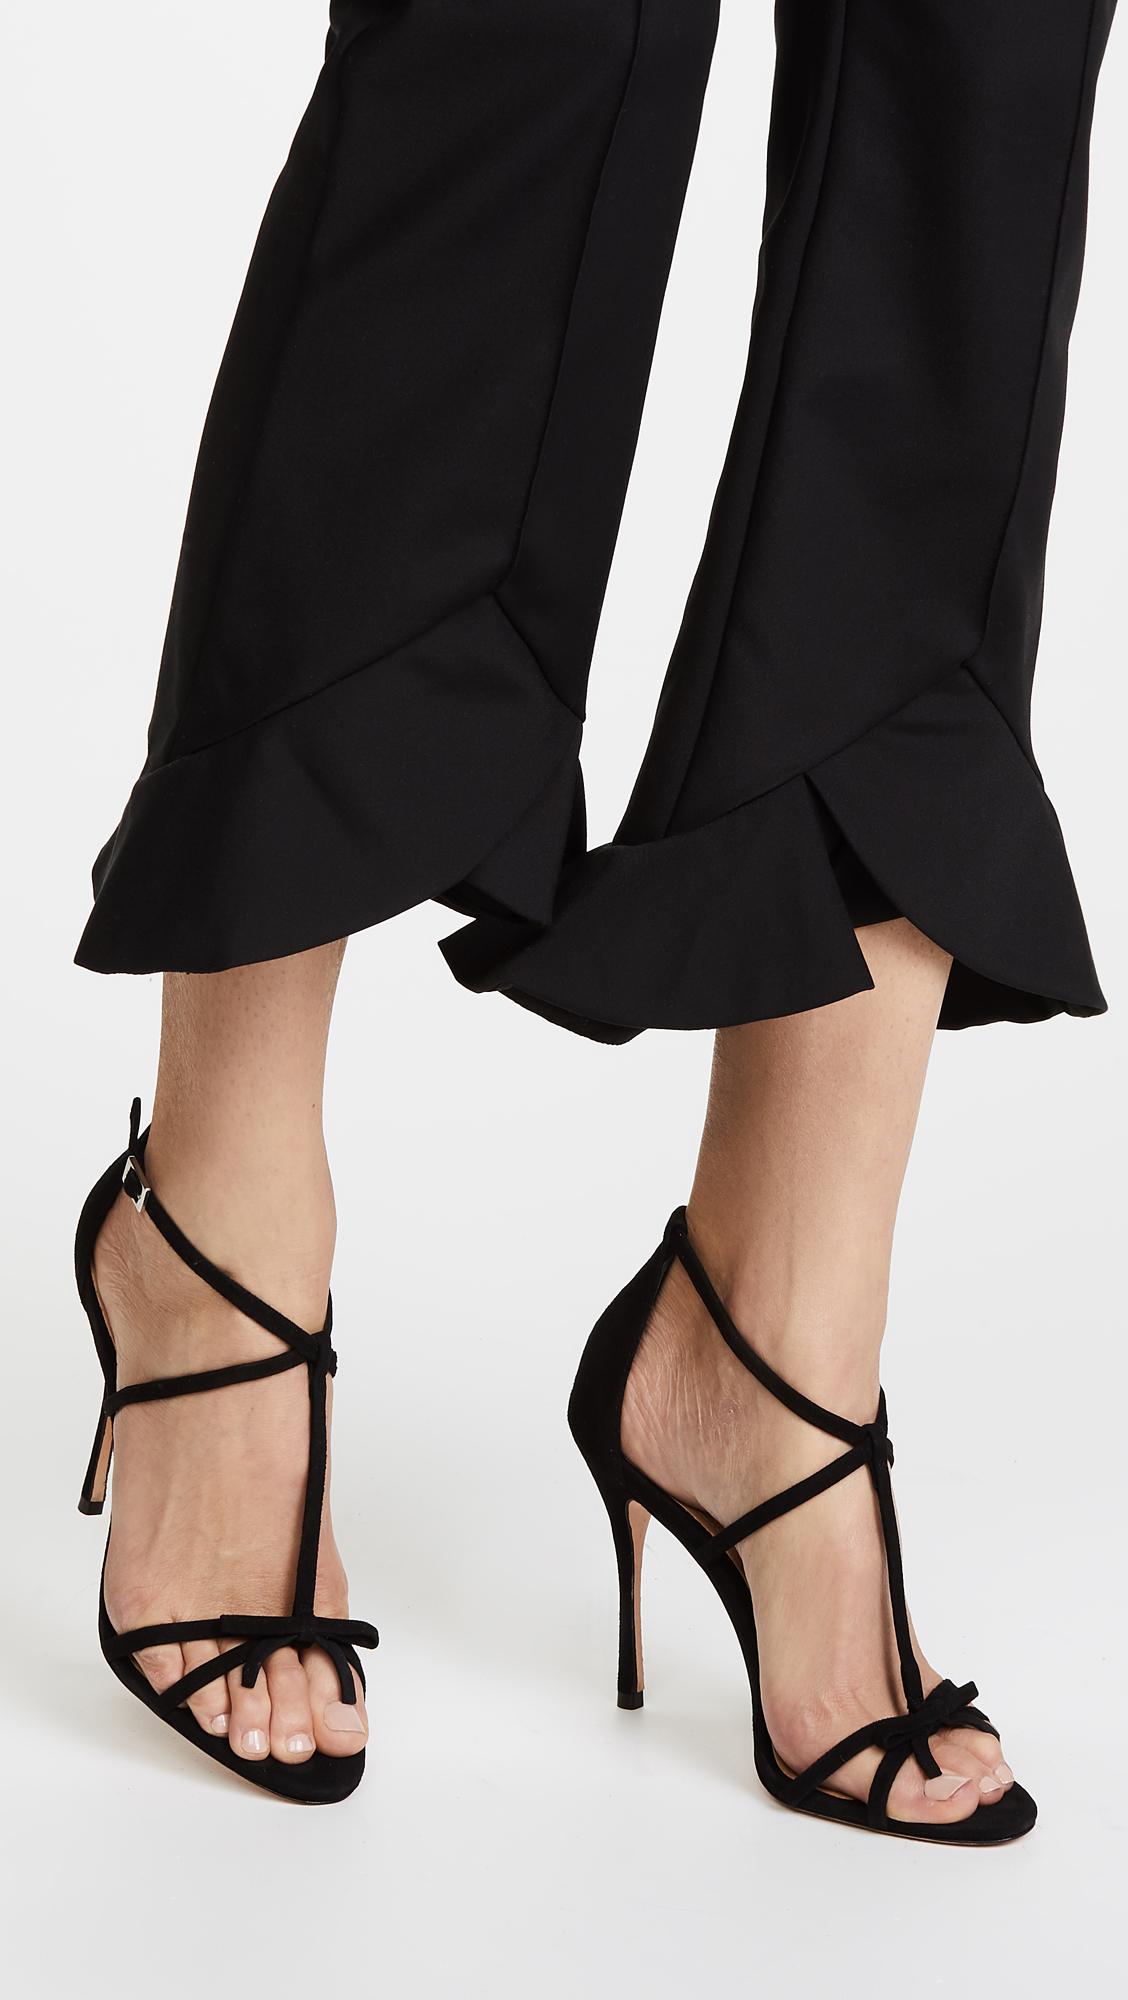 b9dc8e004d6 Women s Shoes Heels SCHUTZ Women s Sabina Strappy Sandals Black Nubuck Open  Toe Single Sole Pumps